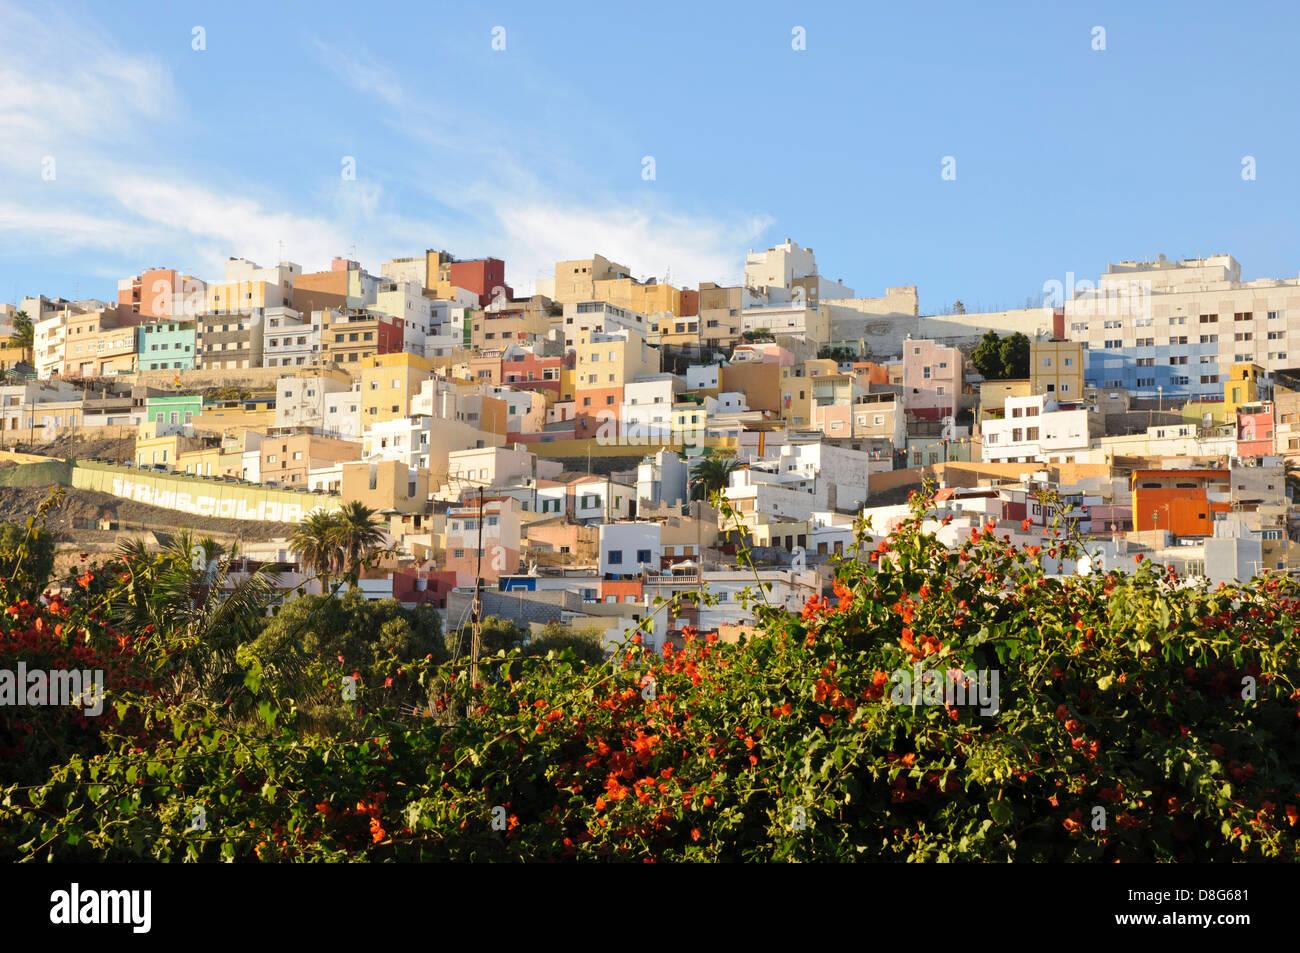 Residential area on a hilltop, Las Palmas de Gran Canaria, Gran Canaria, Canary Islands, Spain, Europe - Stock Image